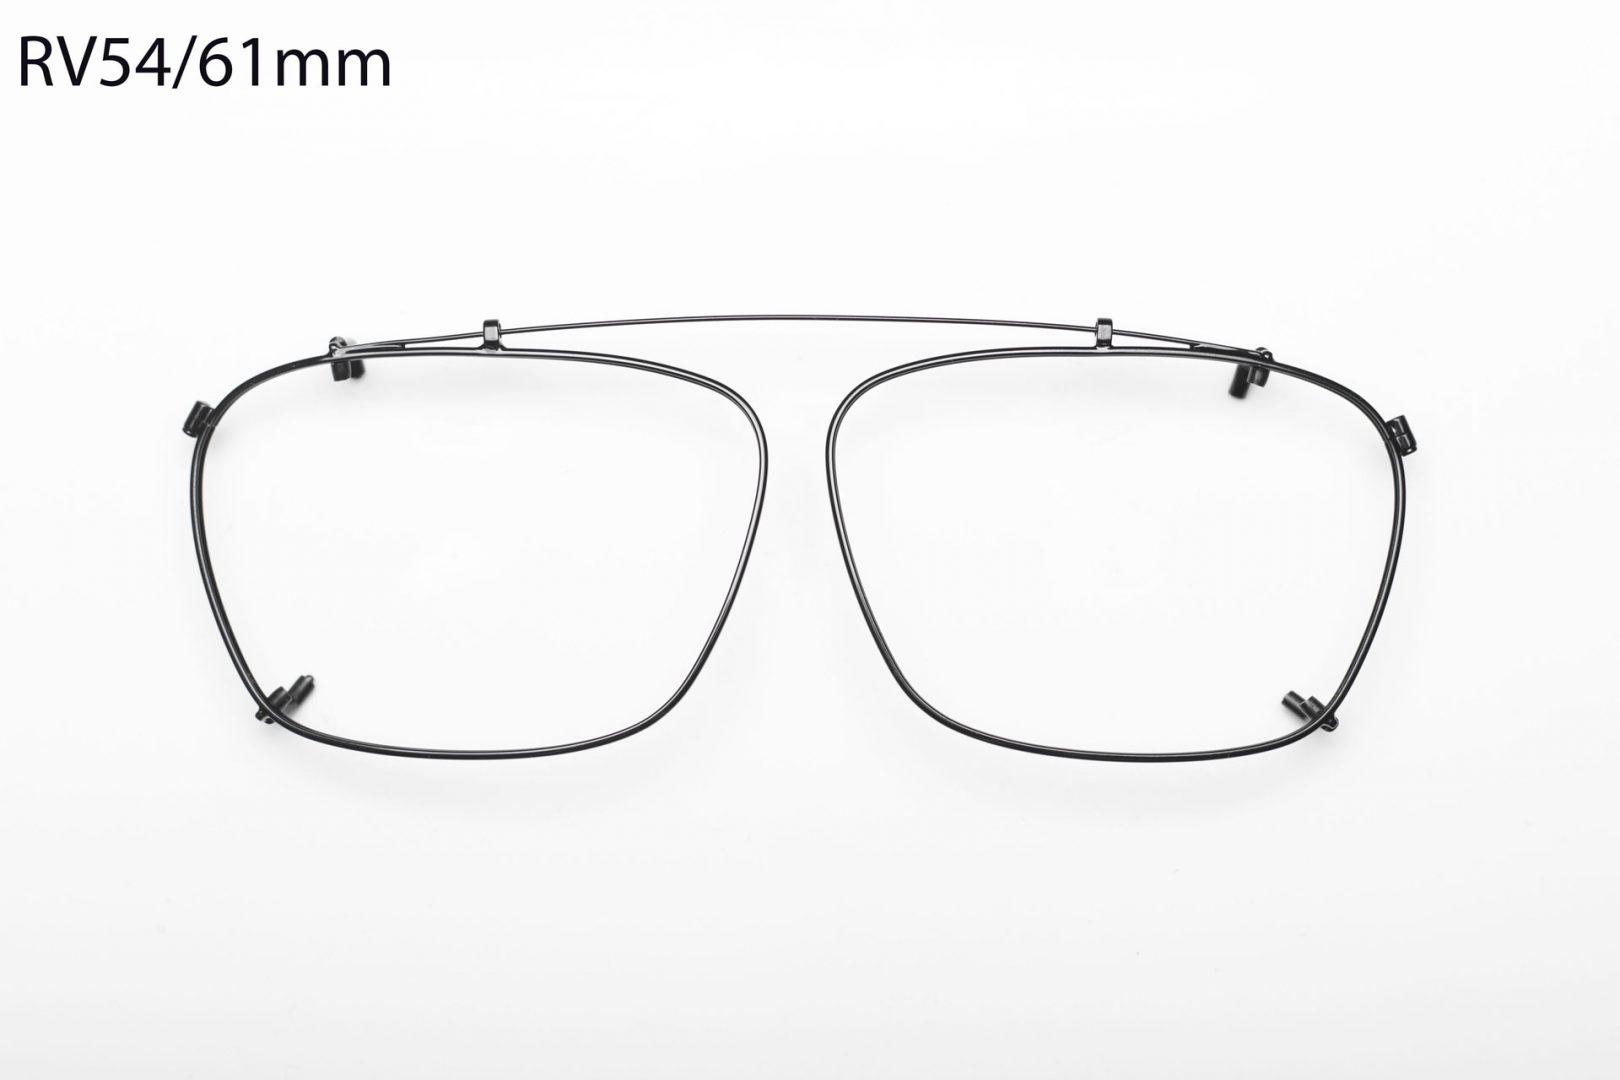 Modèle A22-RV5461mm